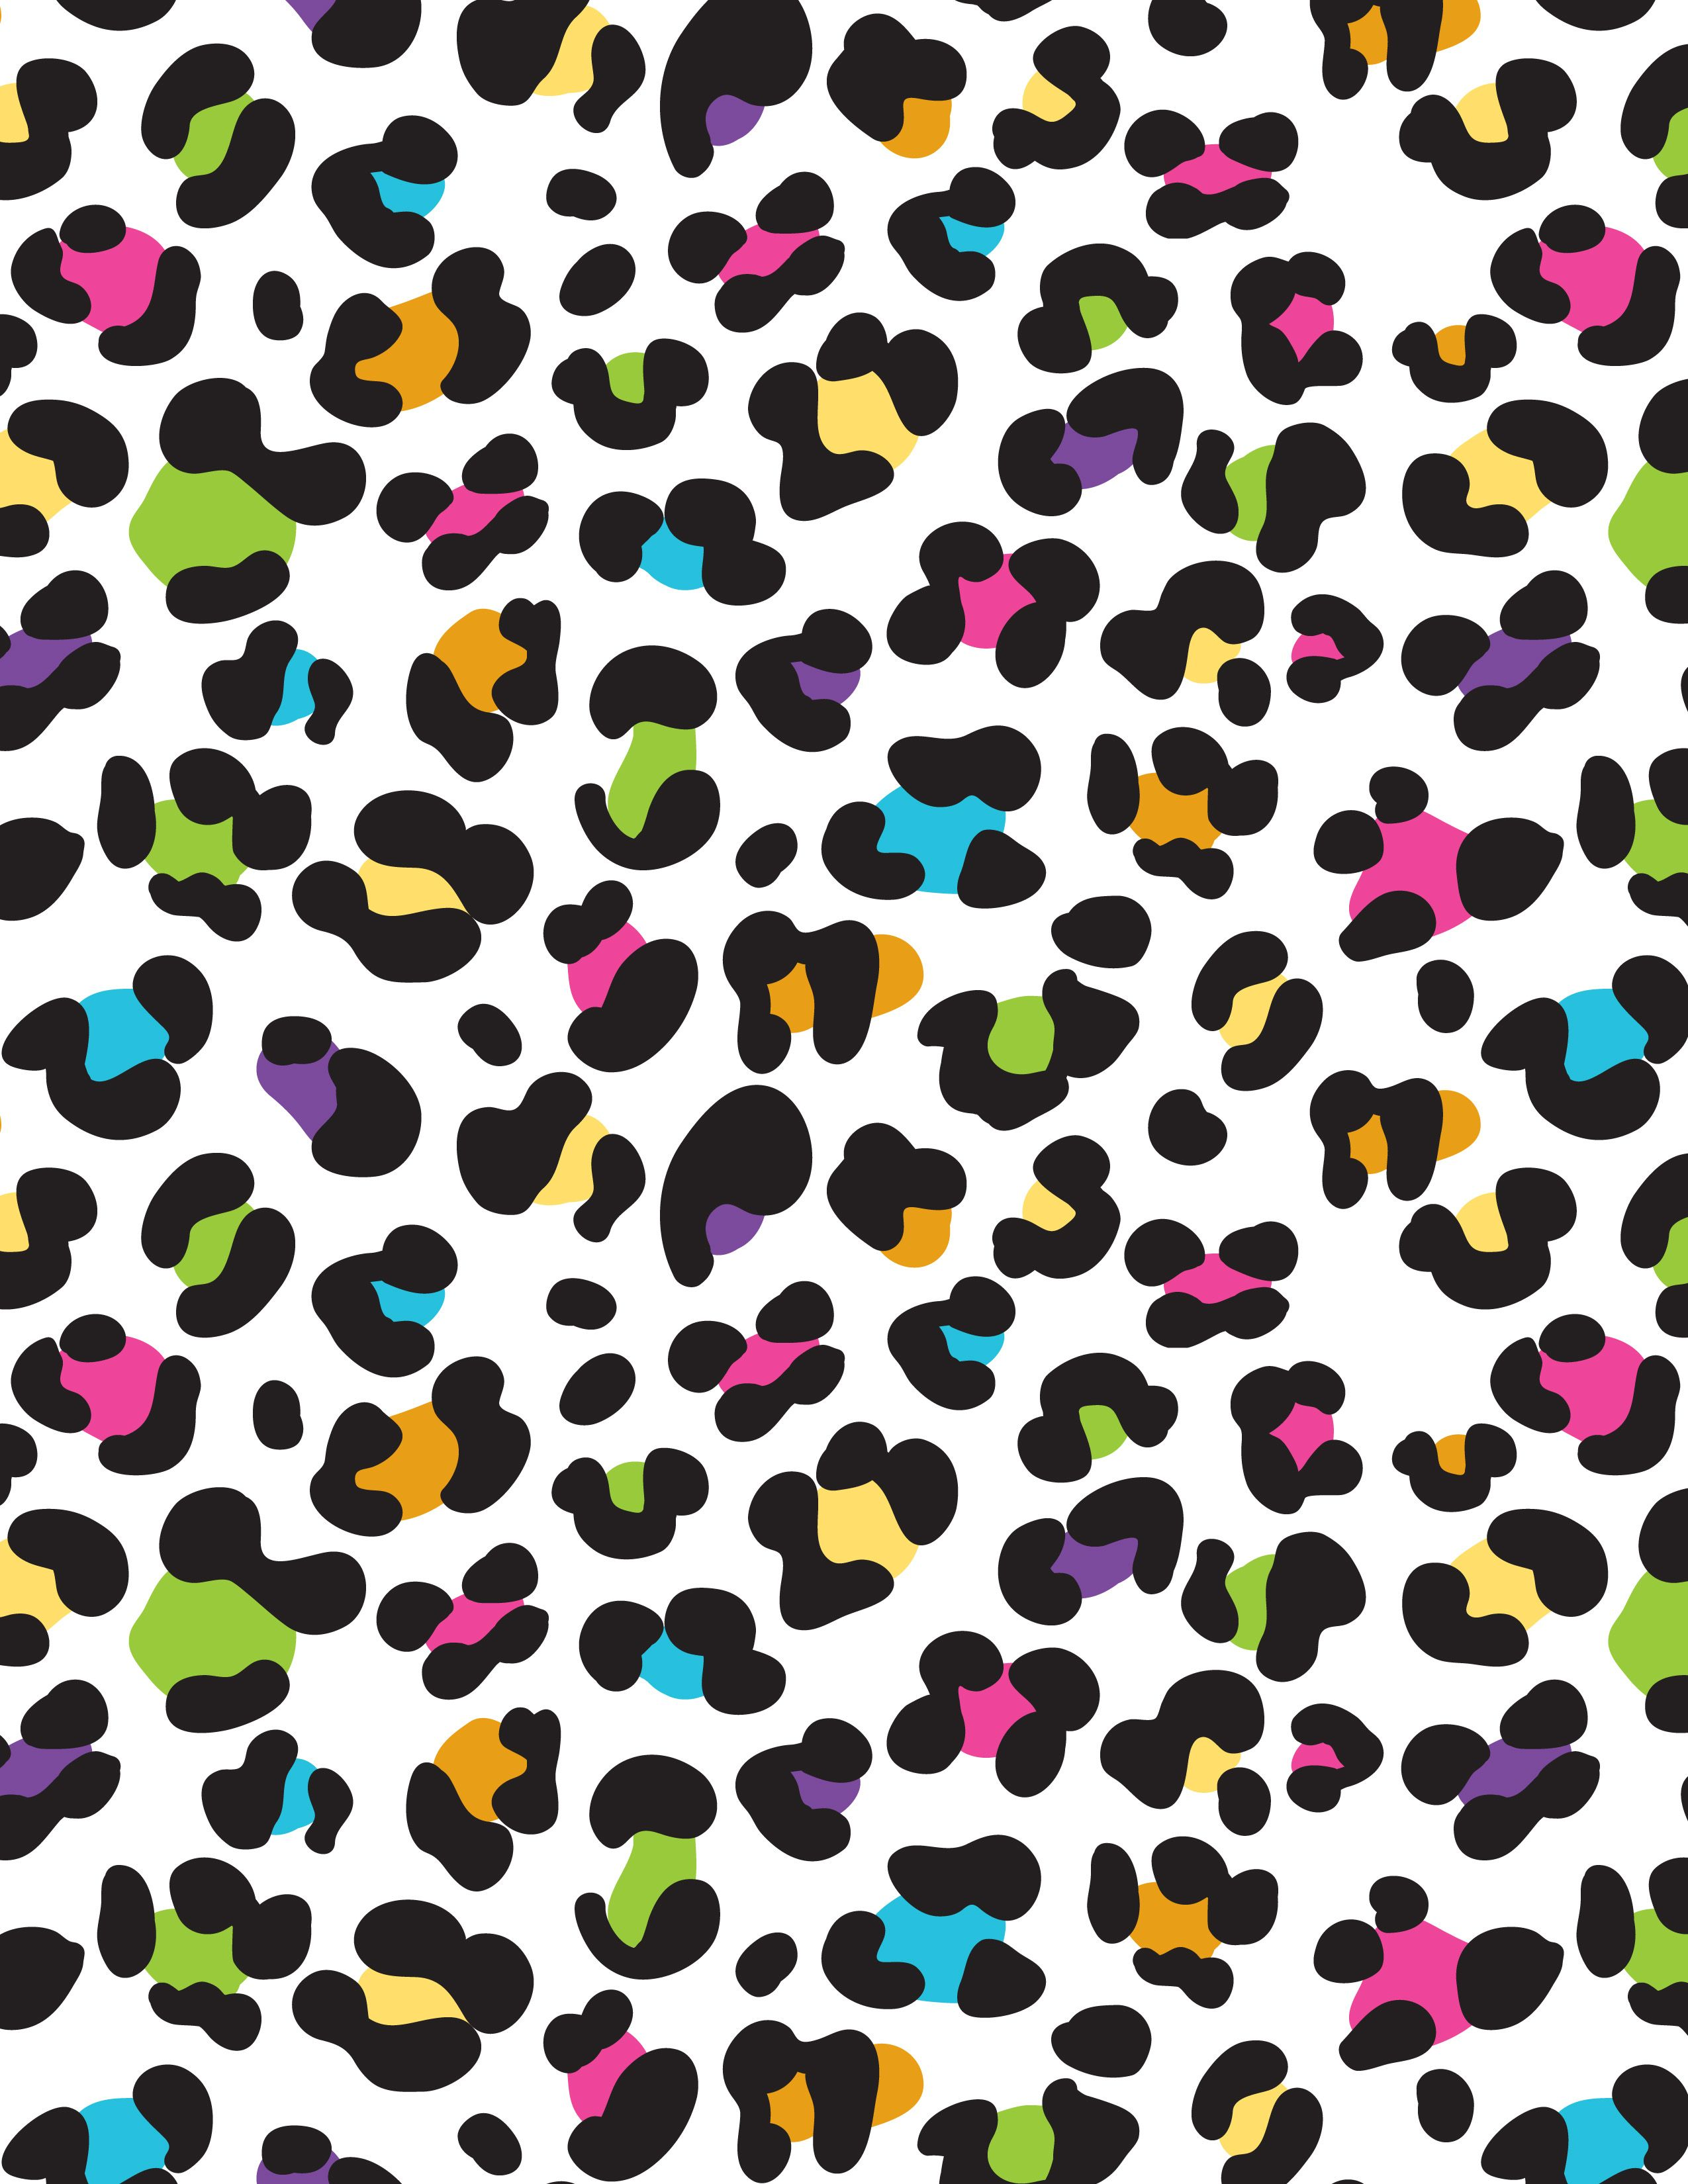 Best Wallpaper Girly Ipod 5 - ee456606cb3915783168afa82fda2443  Collection_335185 .jpg